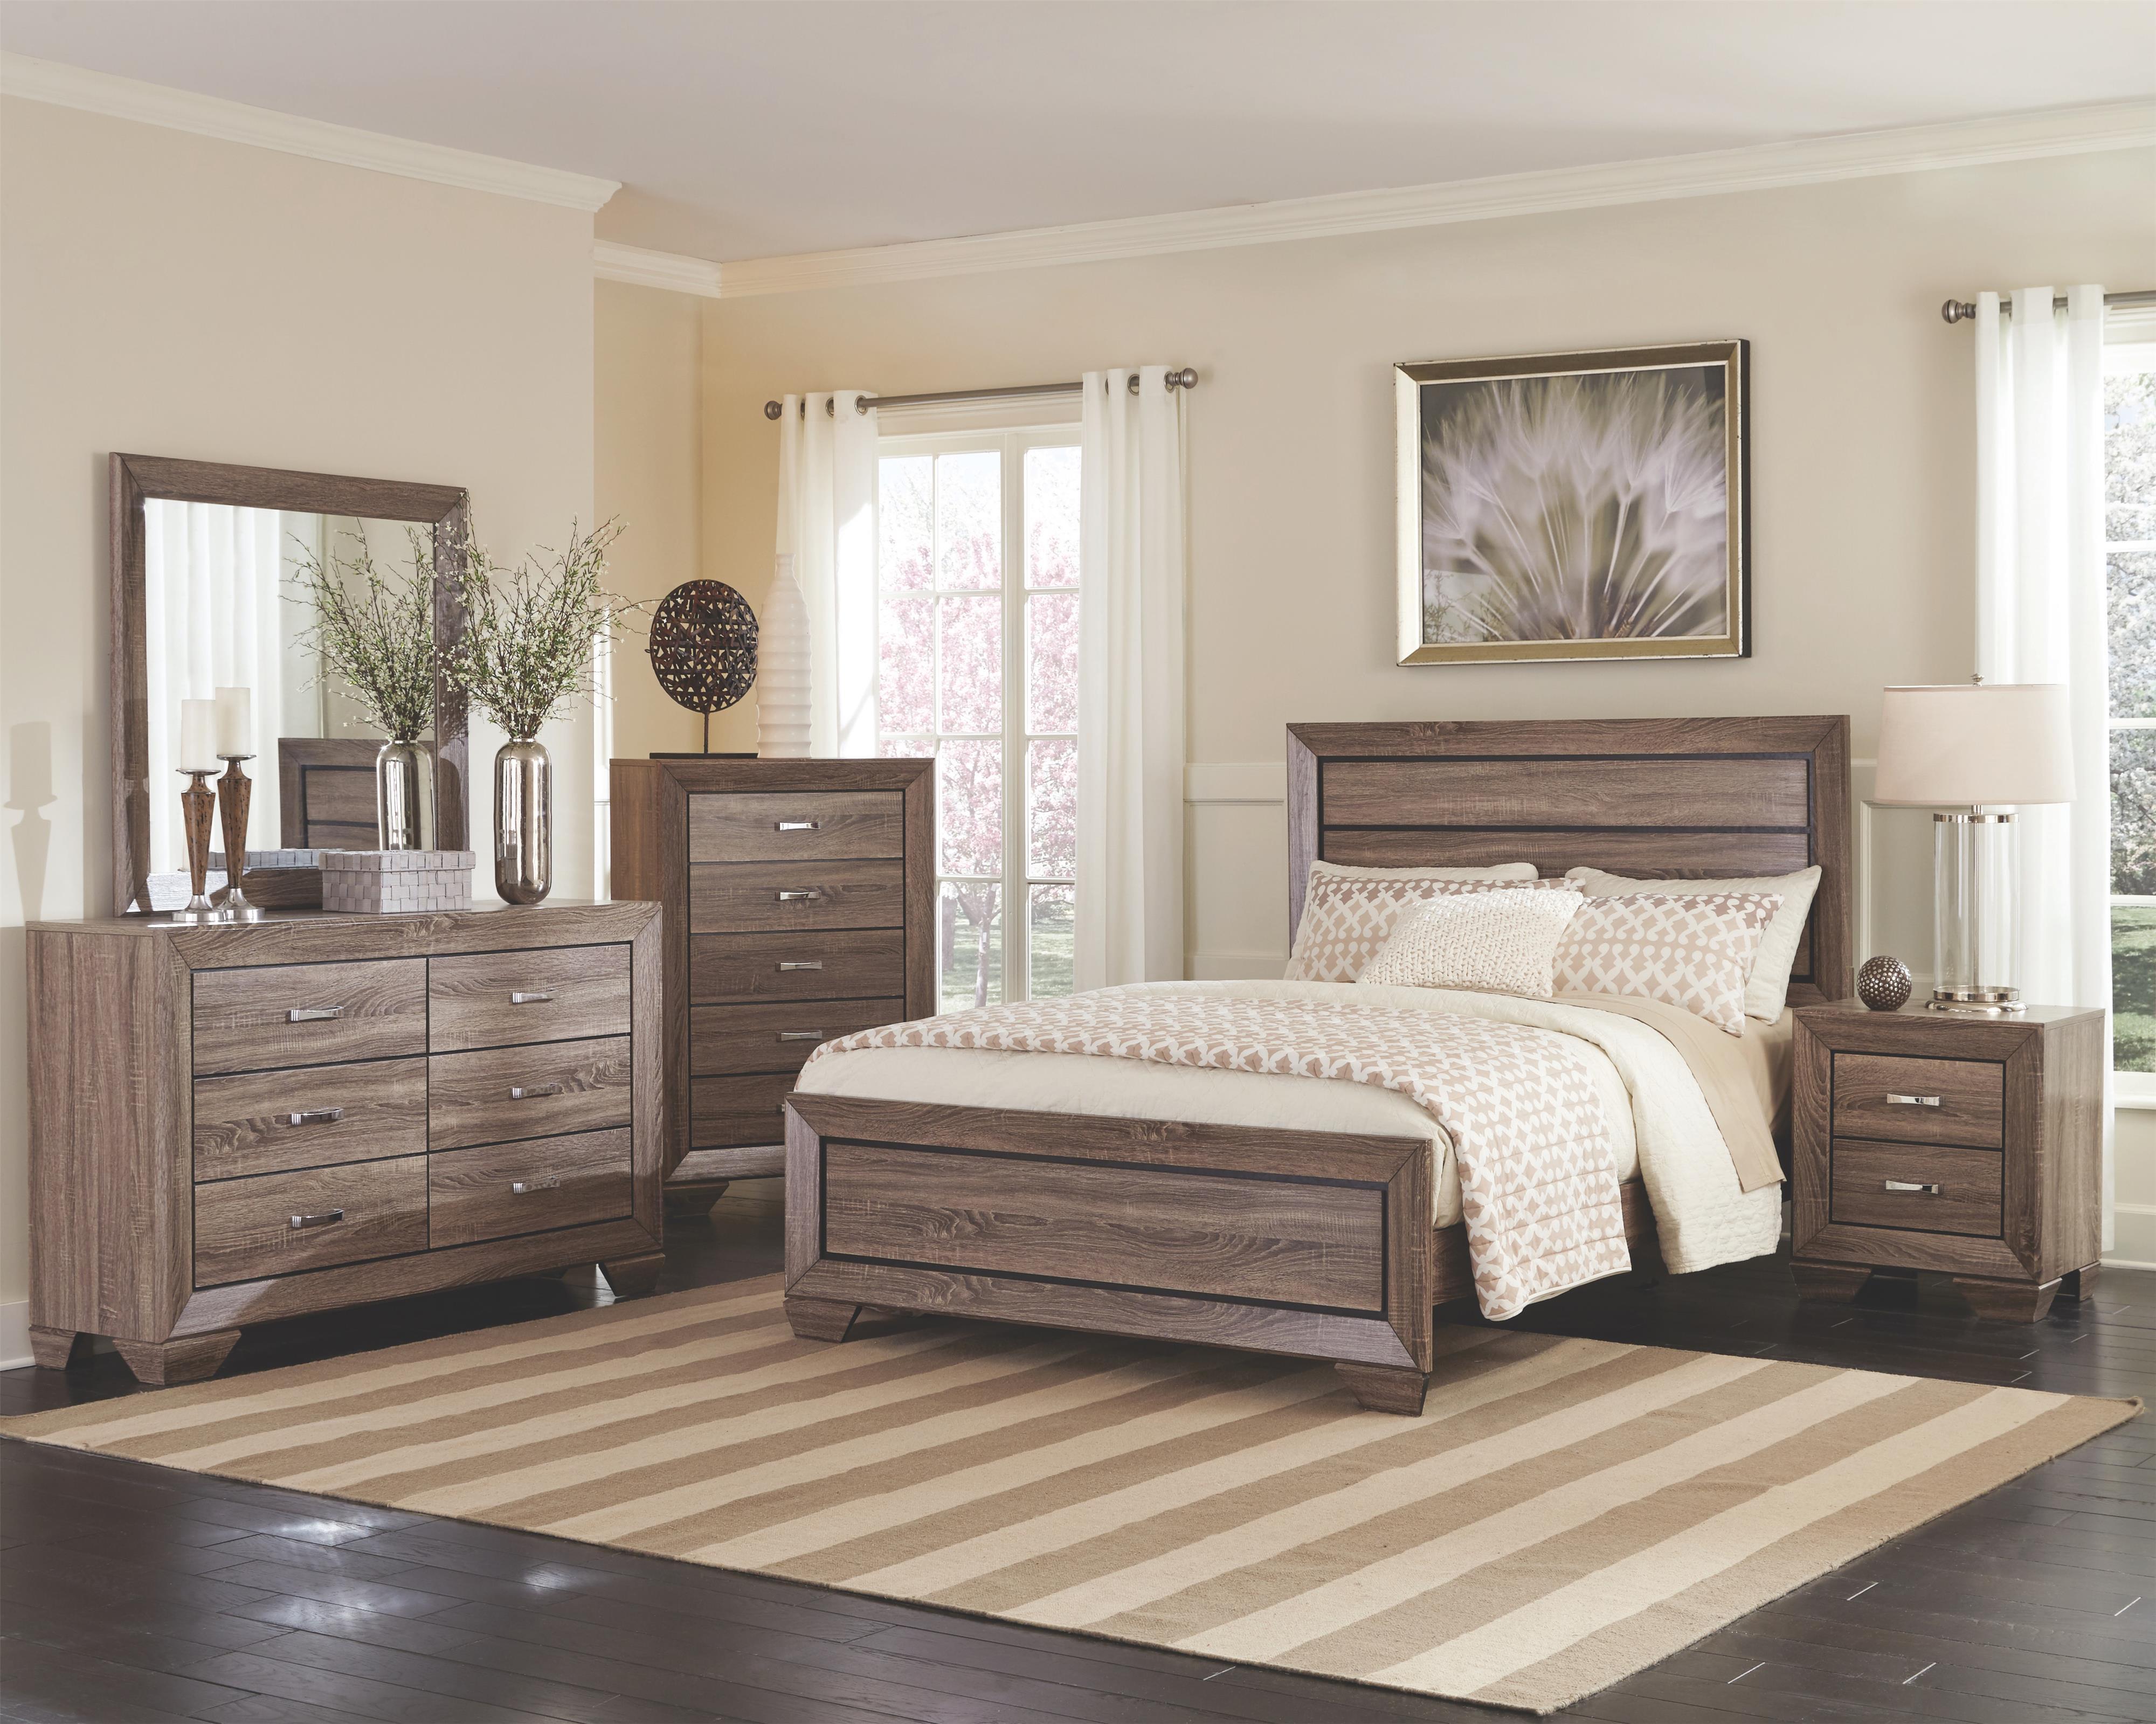 Bedroom Natural Oak Wood Greyish Brown Panel Design Eastern King Size Bed 4pc Set Modern Dresser Mirror Nightstand Walmart Com Walmart Com